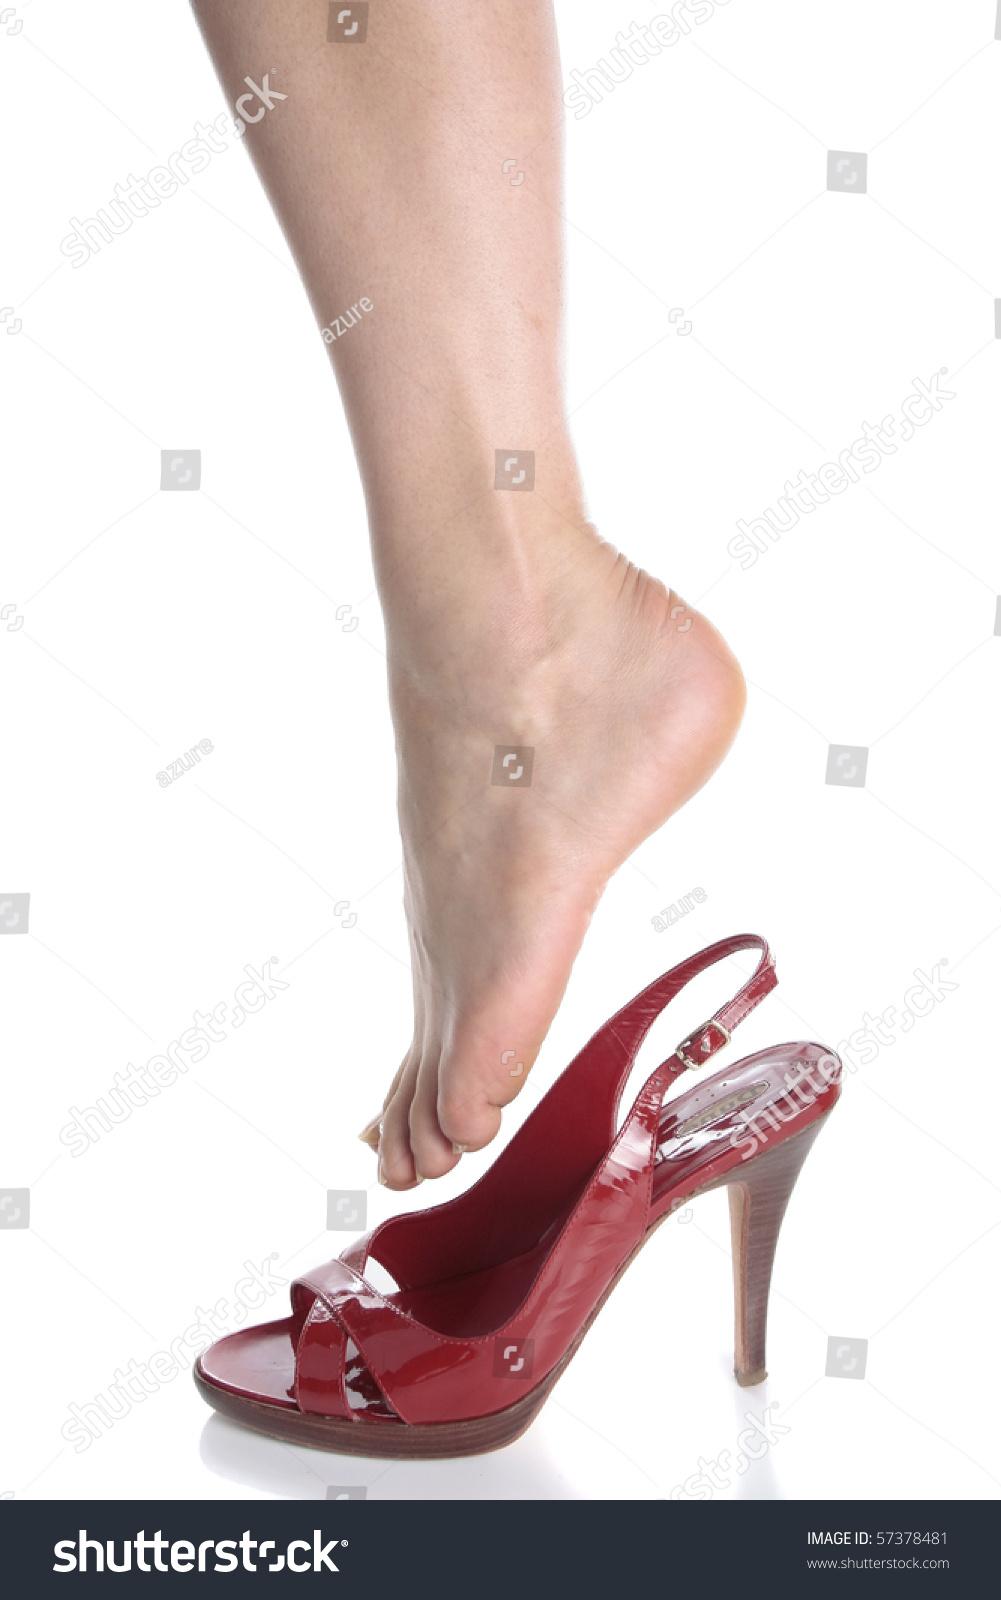 Beautiful Woman Legs Red Heel Shoes Stock